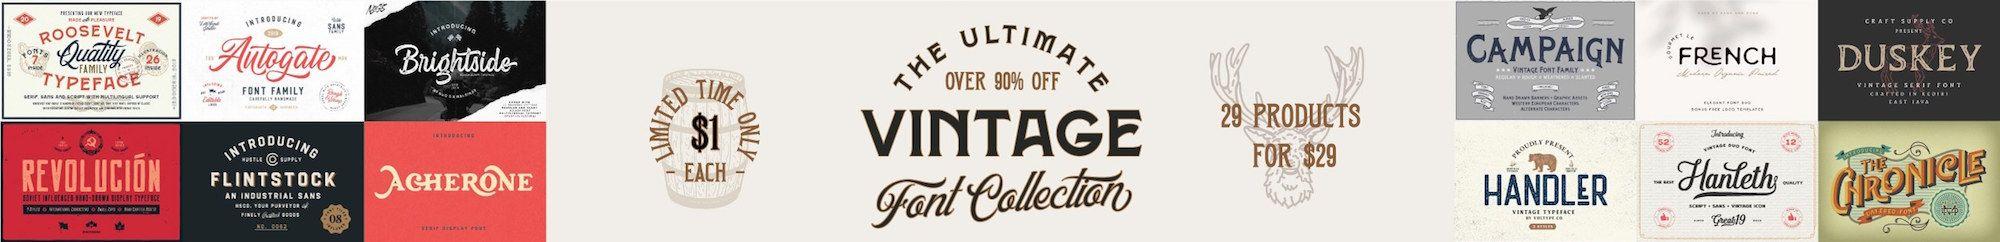 Understock Free Vintage Serif Font Pixel Surplus Resources For Designers Logo Mockup Branding Mockups Realistic